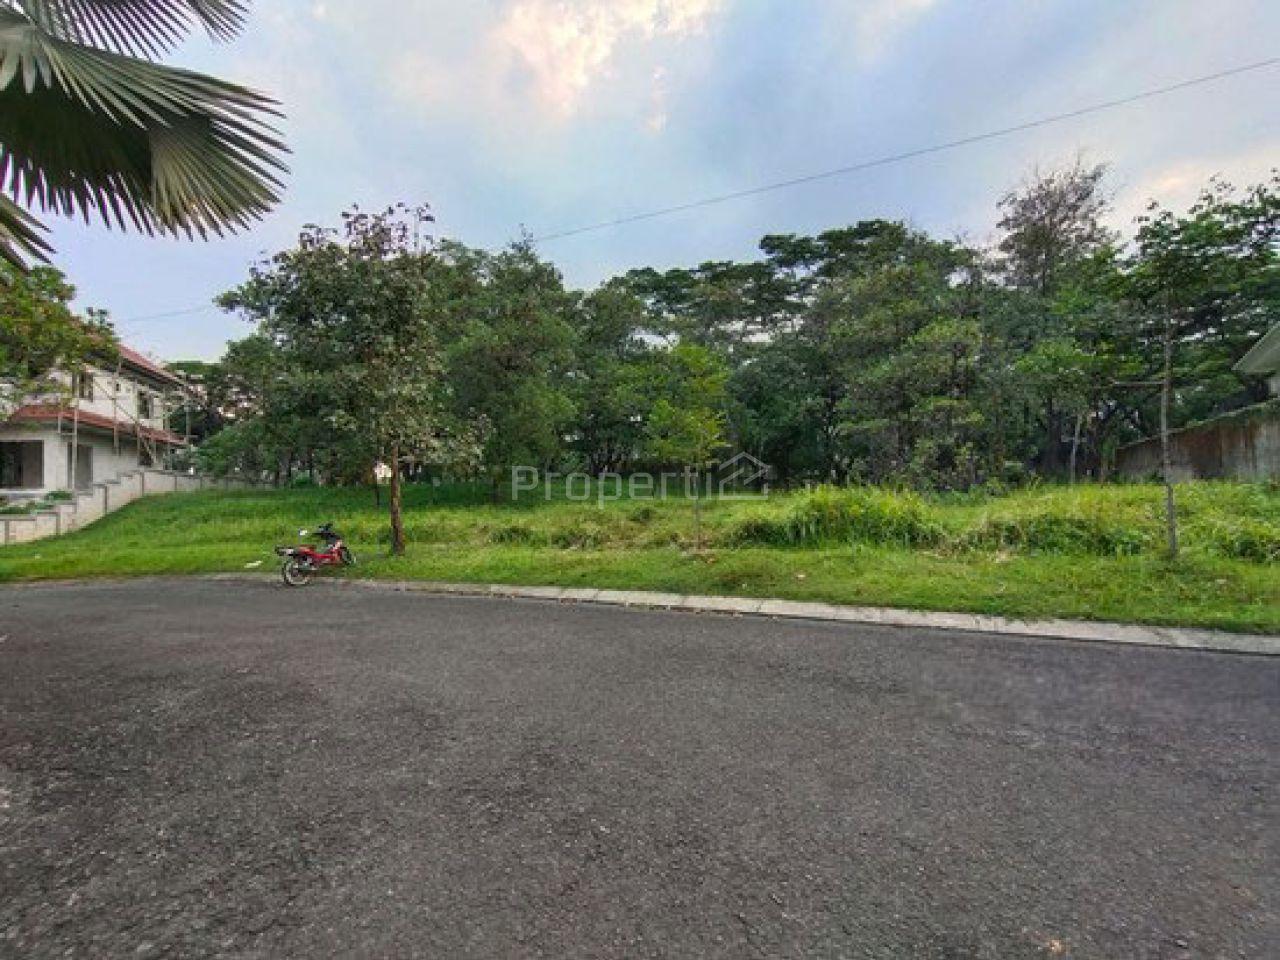 Plot Land at Mediterania Golf II Sentul City, Jawa Barat